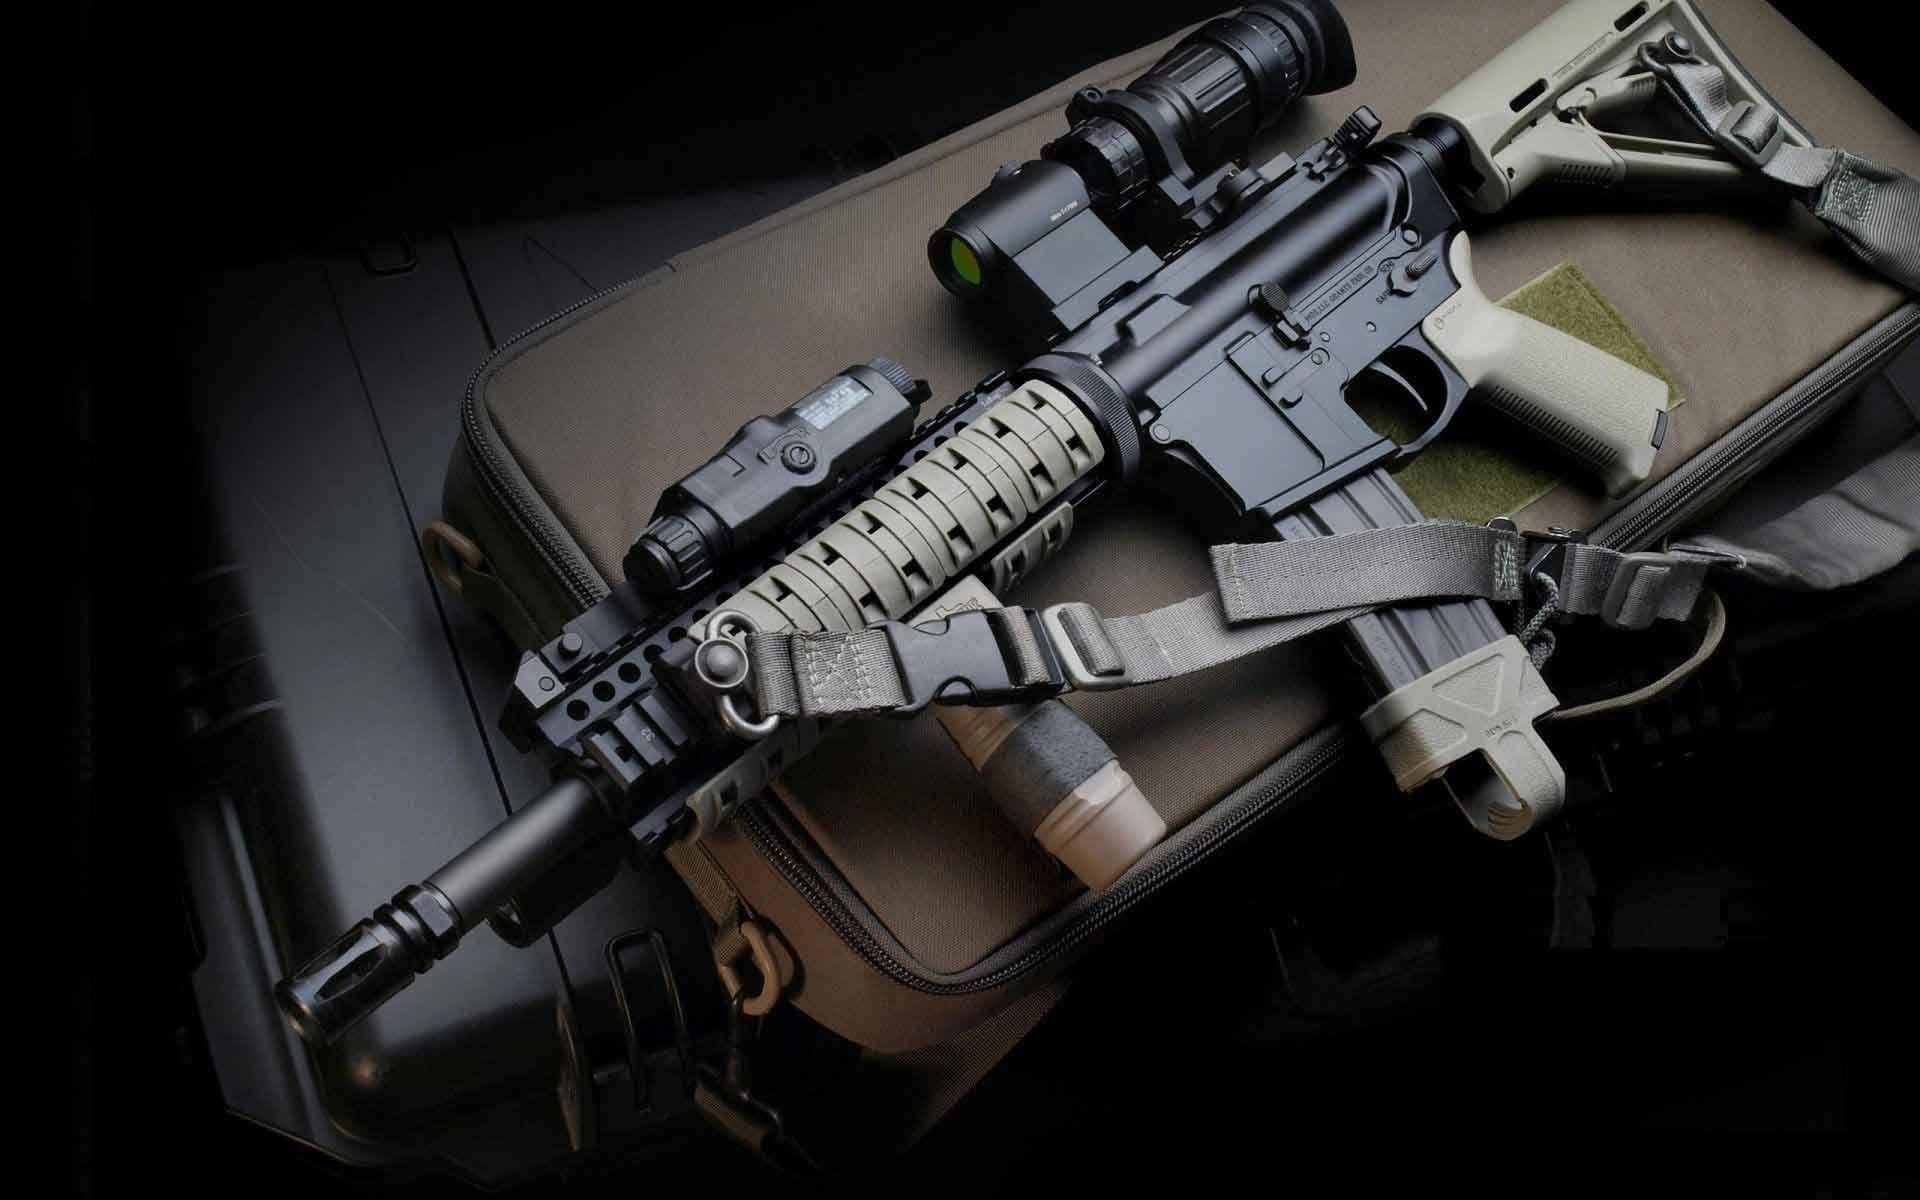 sniper rifles hd desktop wallpaper army snipers weapons sniper rifles